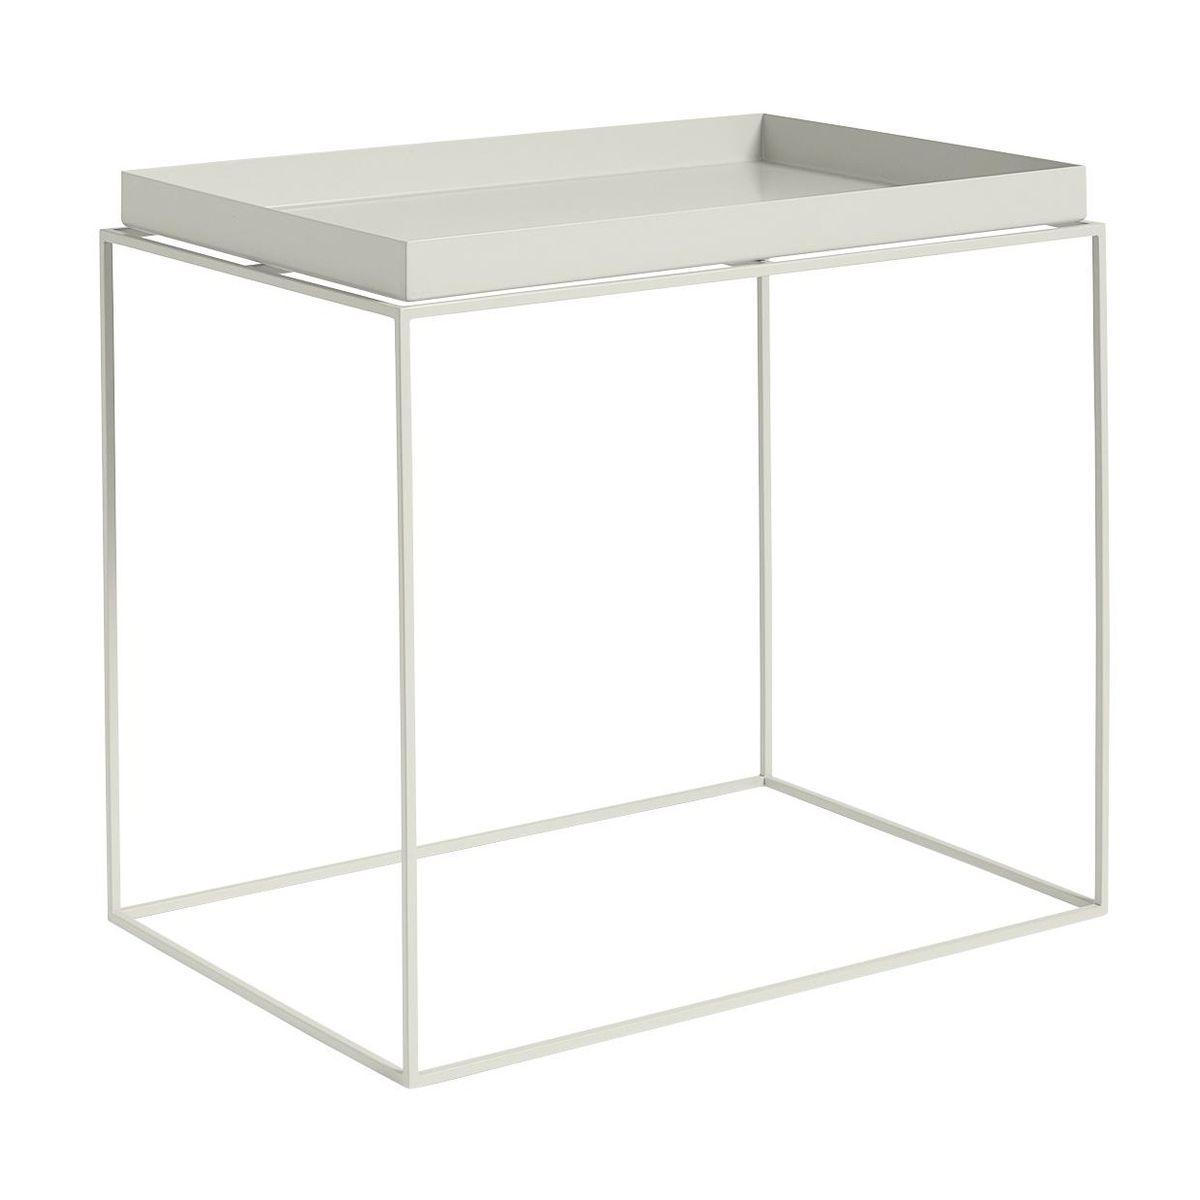 tray table beistelltisch rechteckig hay. Black Bedroom Furniture Sets. Home Design Ideas